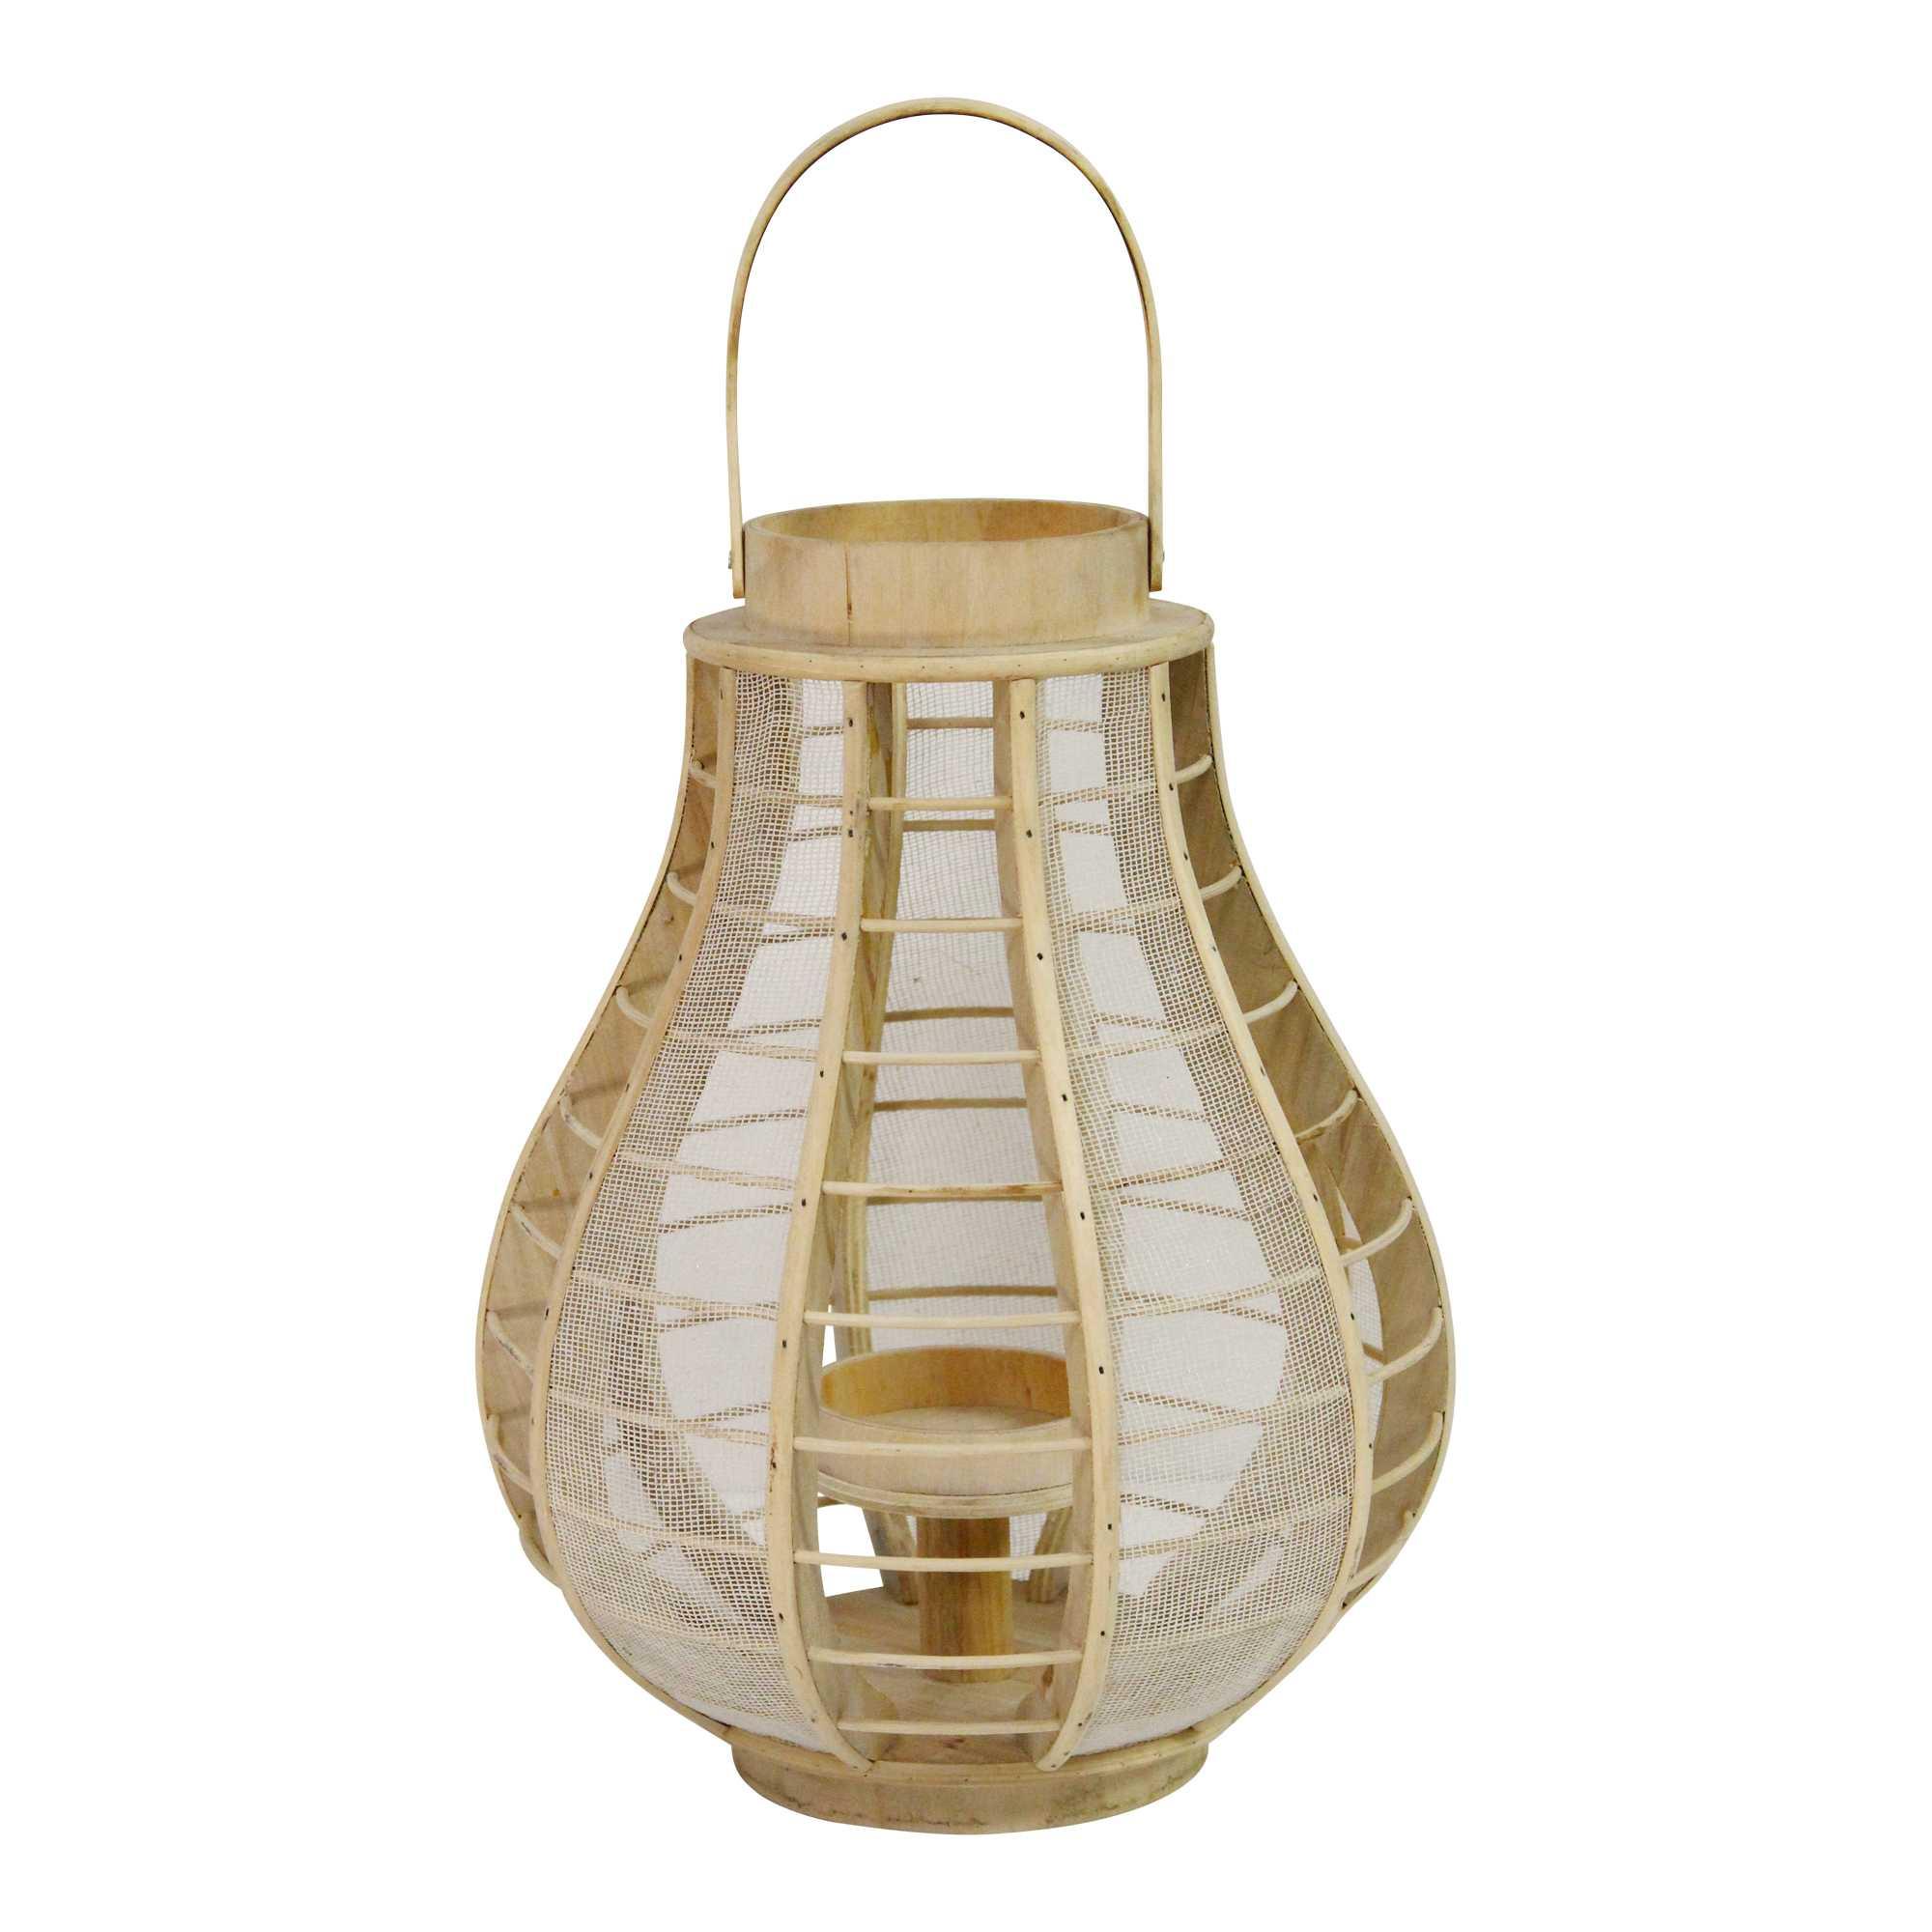 Bamboo and Wood Burlap Mesh Lantern